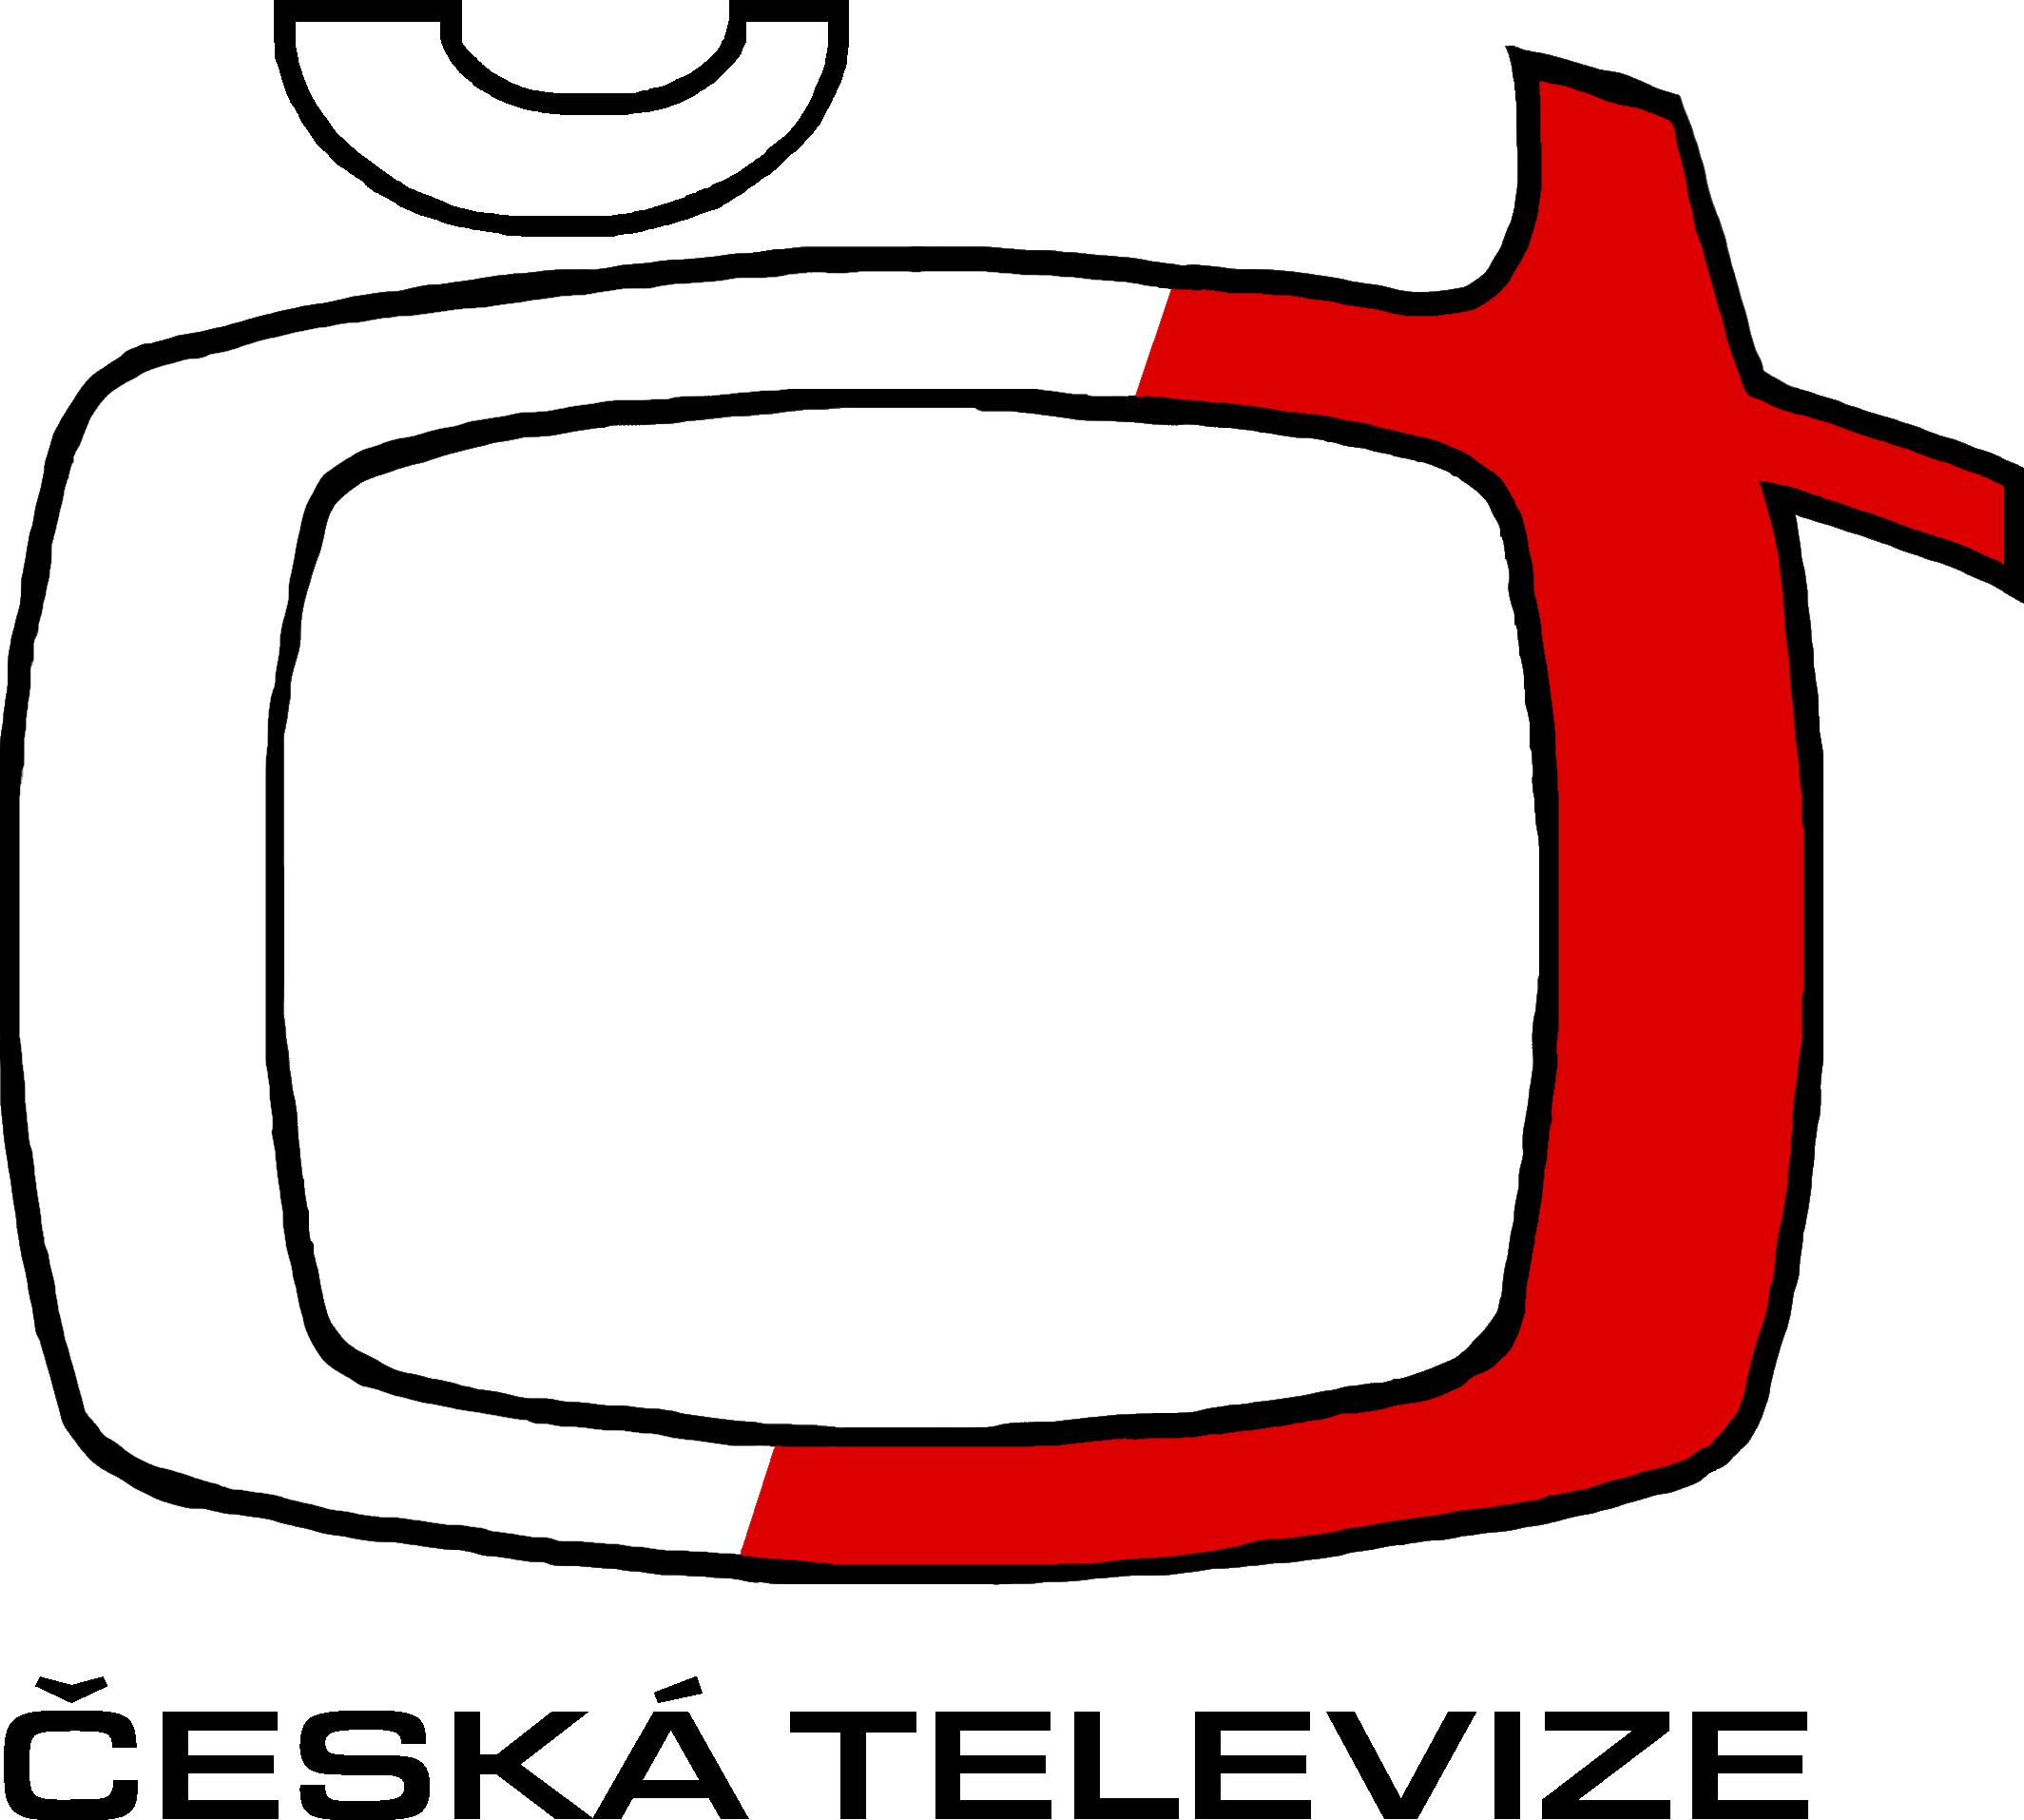 Česká televize   Logopedia   FANDOM powered by Wikia